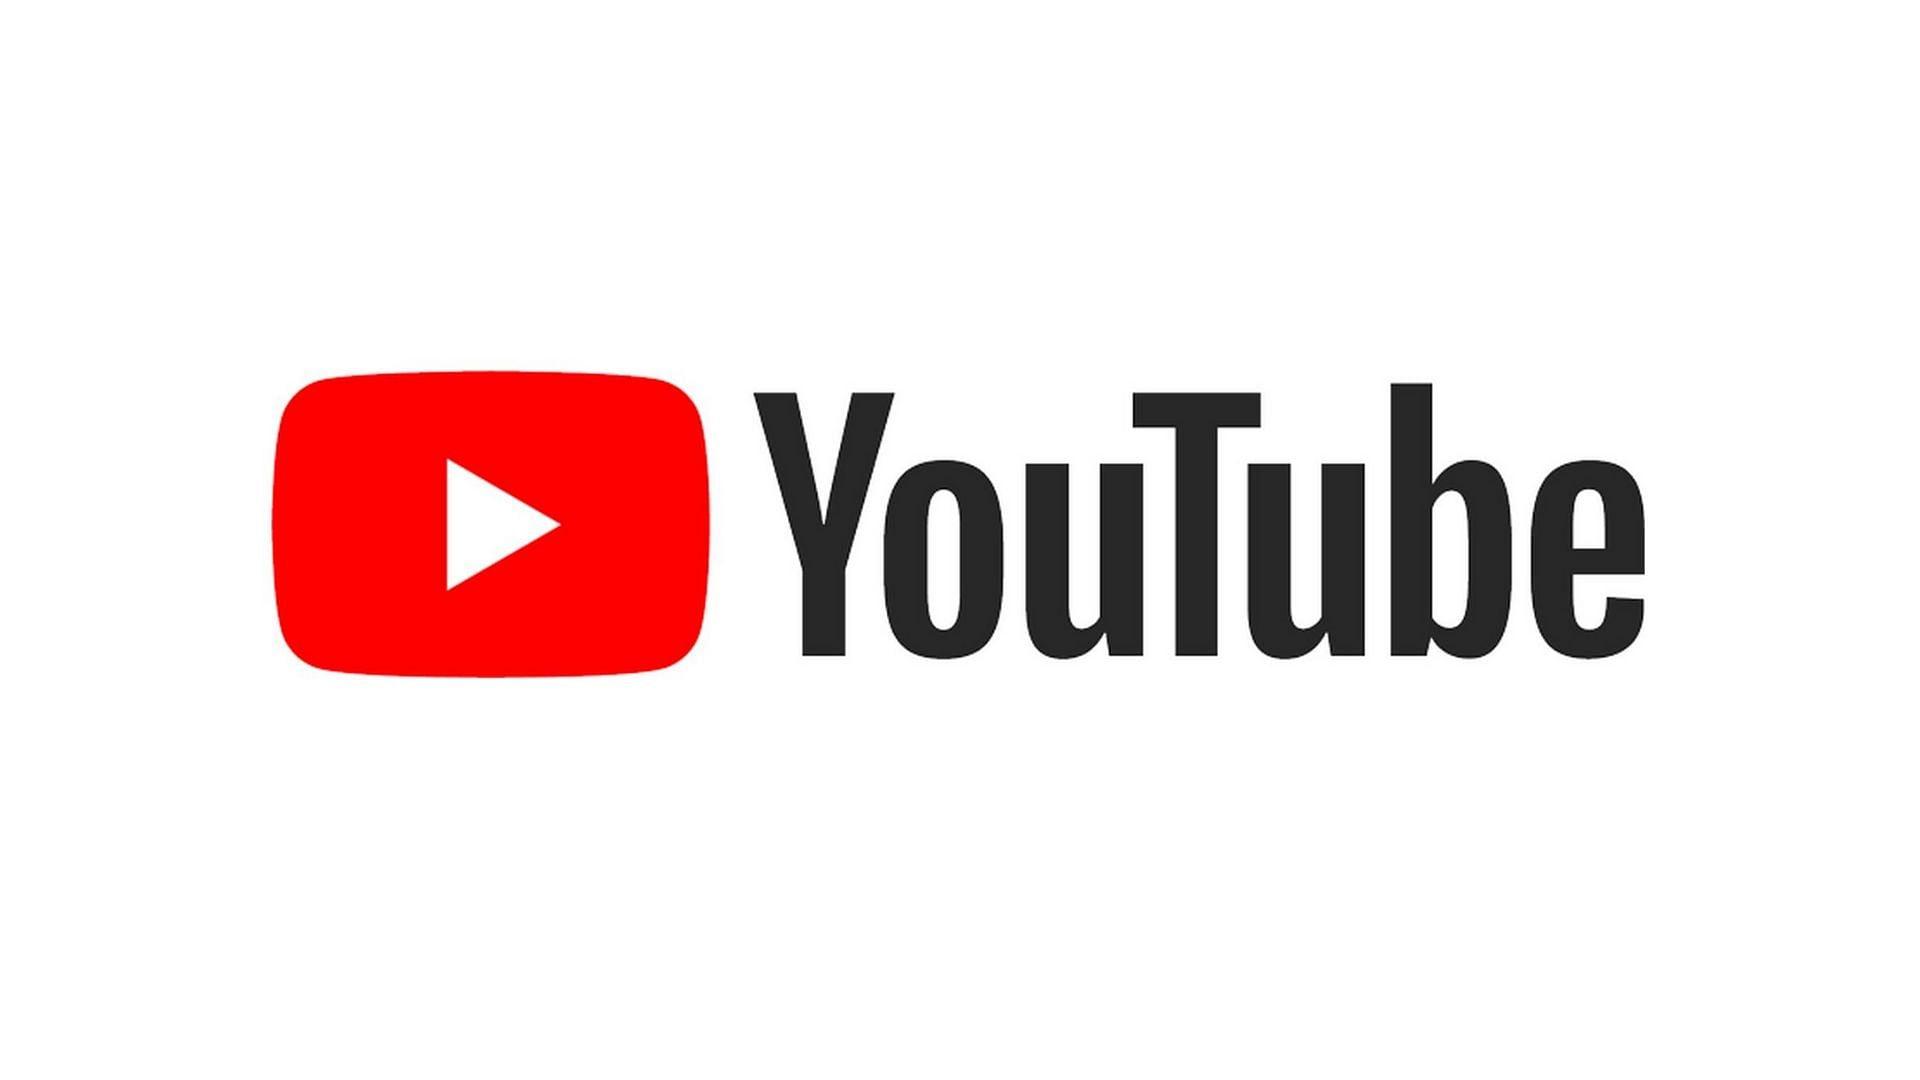 Youtubenewshowbutton?blur=25